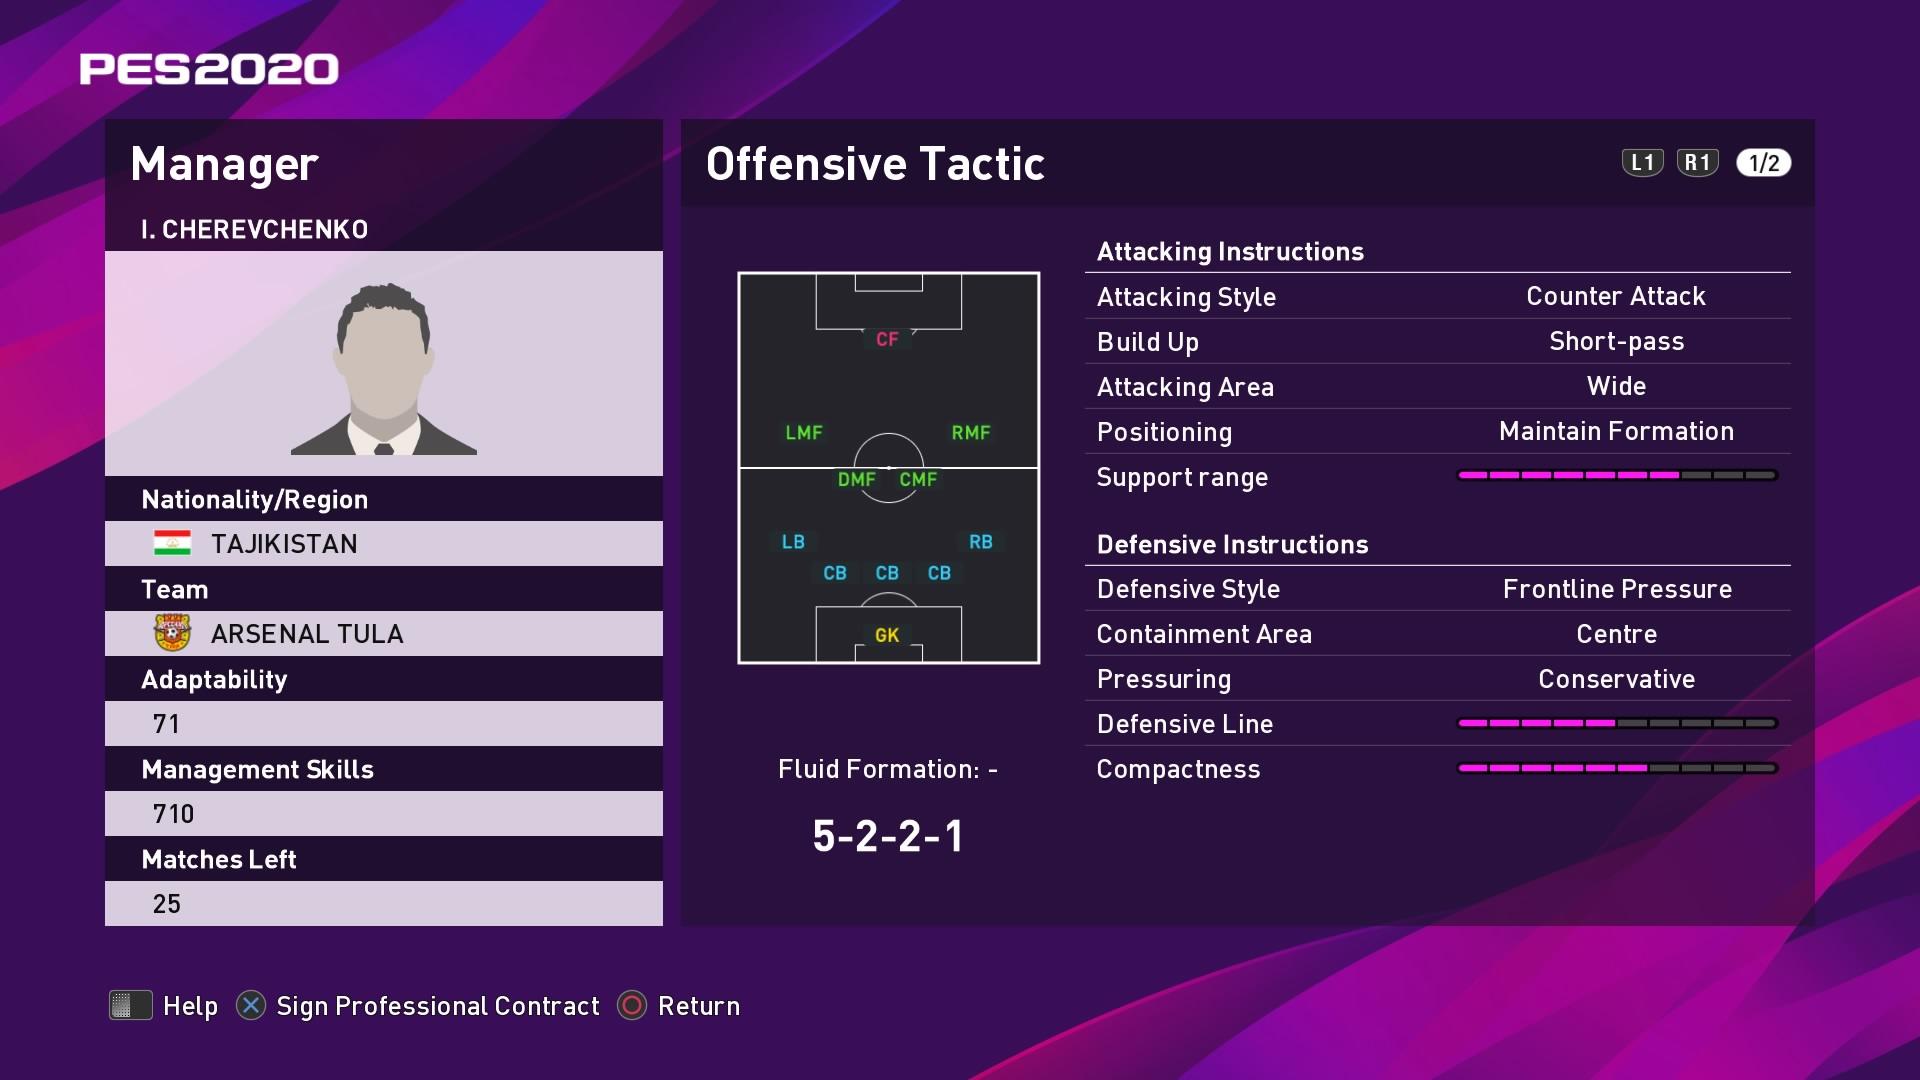 I. Cherevchenko (Igor Cherevchenko) Offensive Tactic in PES 2020 myClub